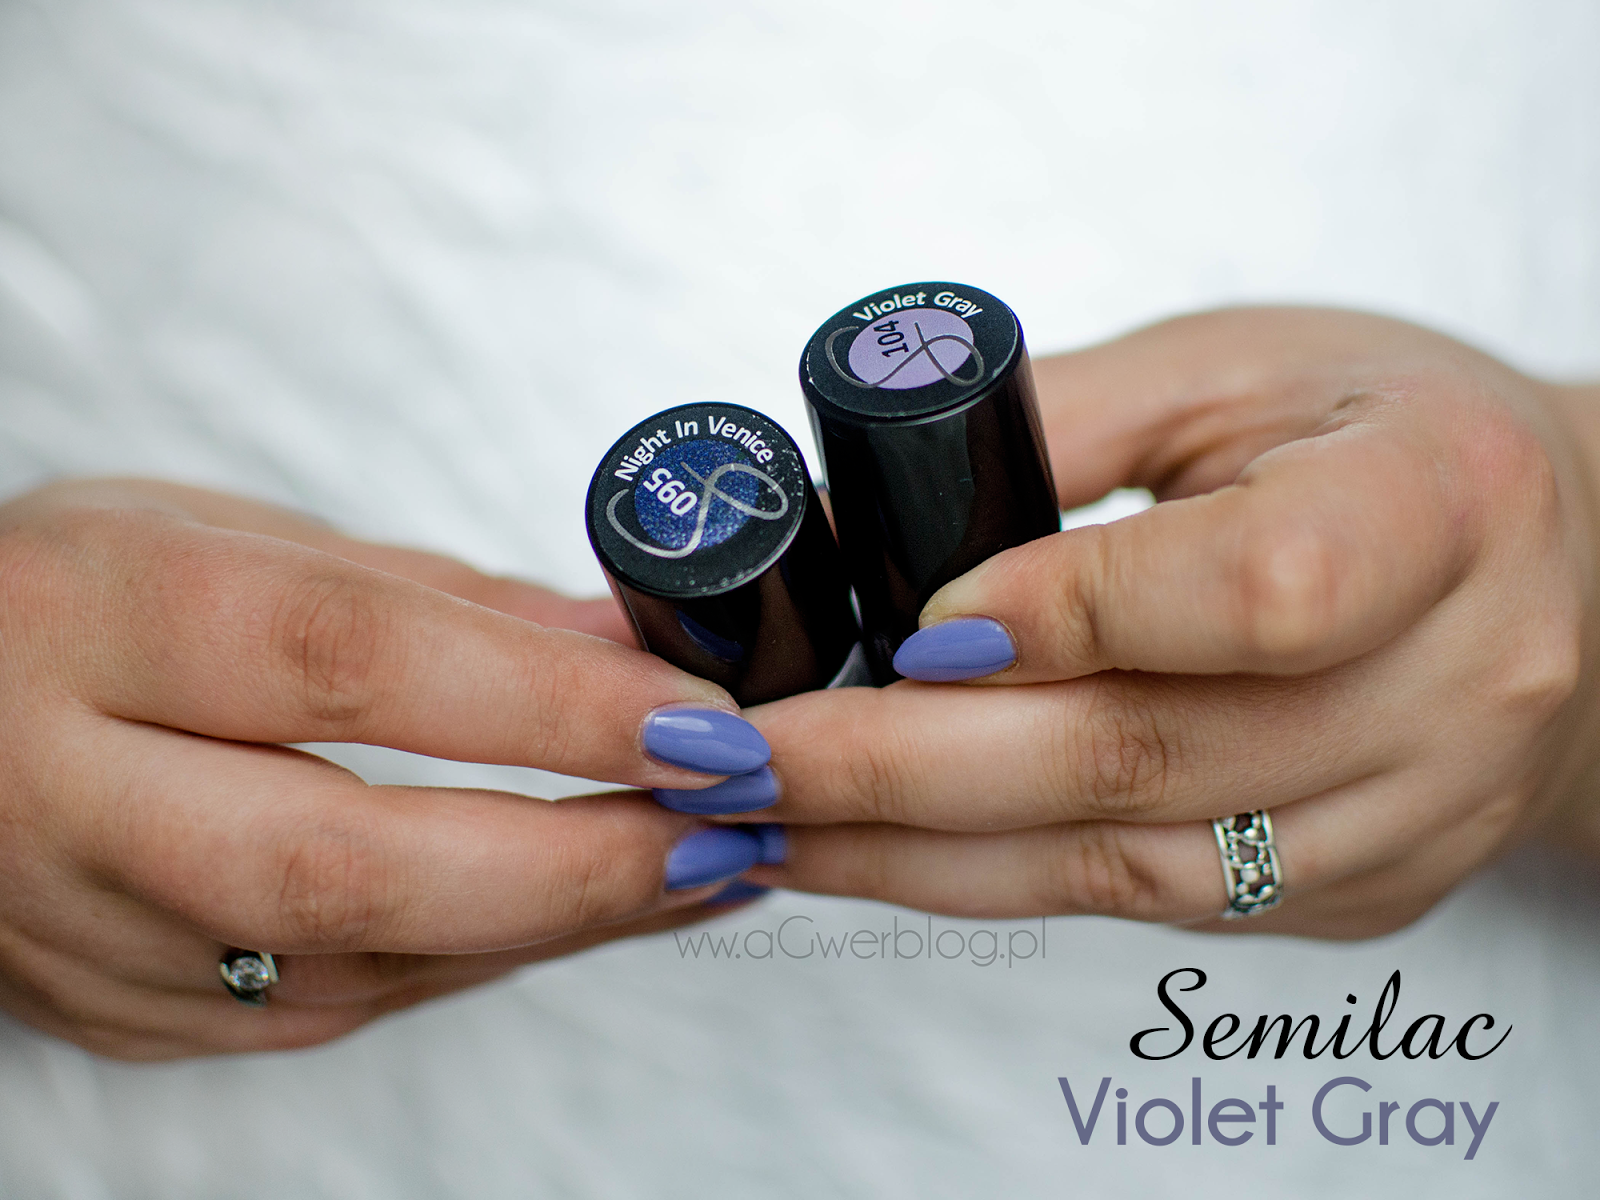 Najpiękniejszy fiolet: Semilac Violet Gray